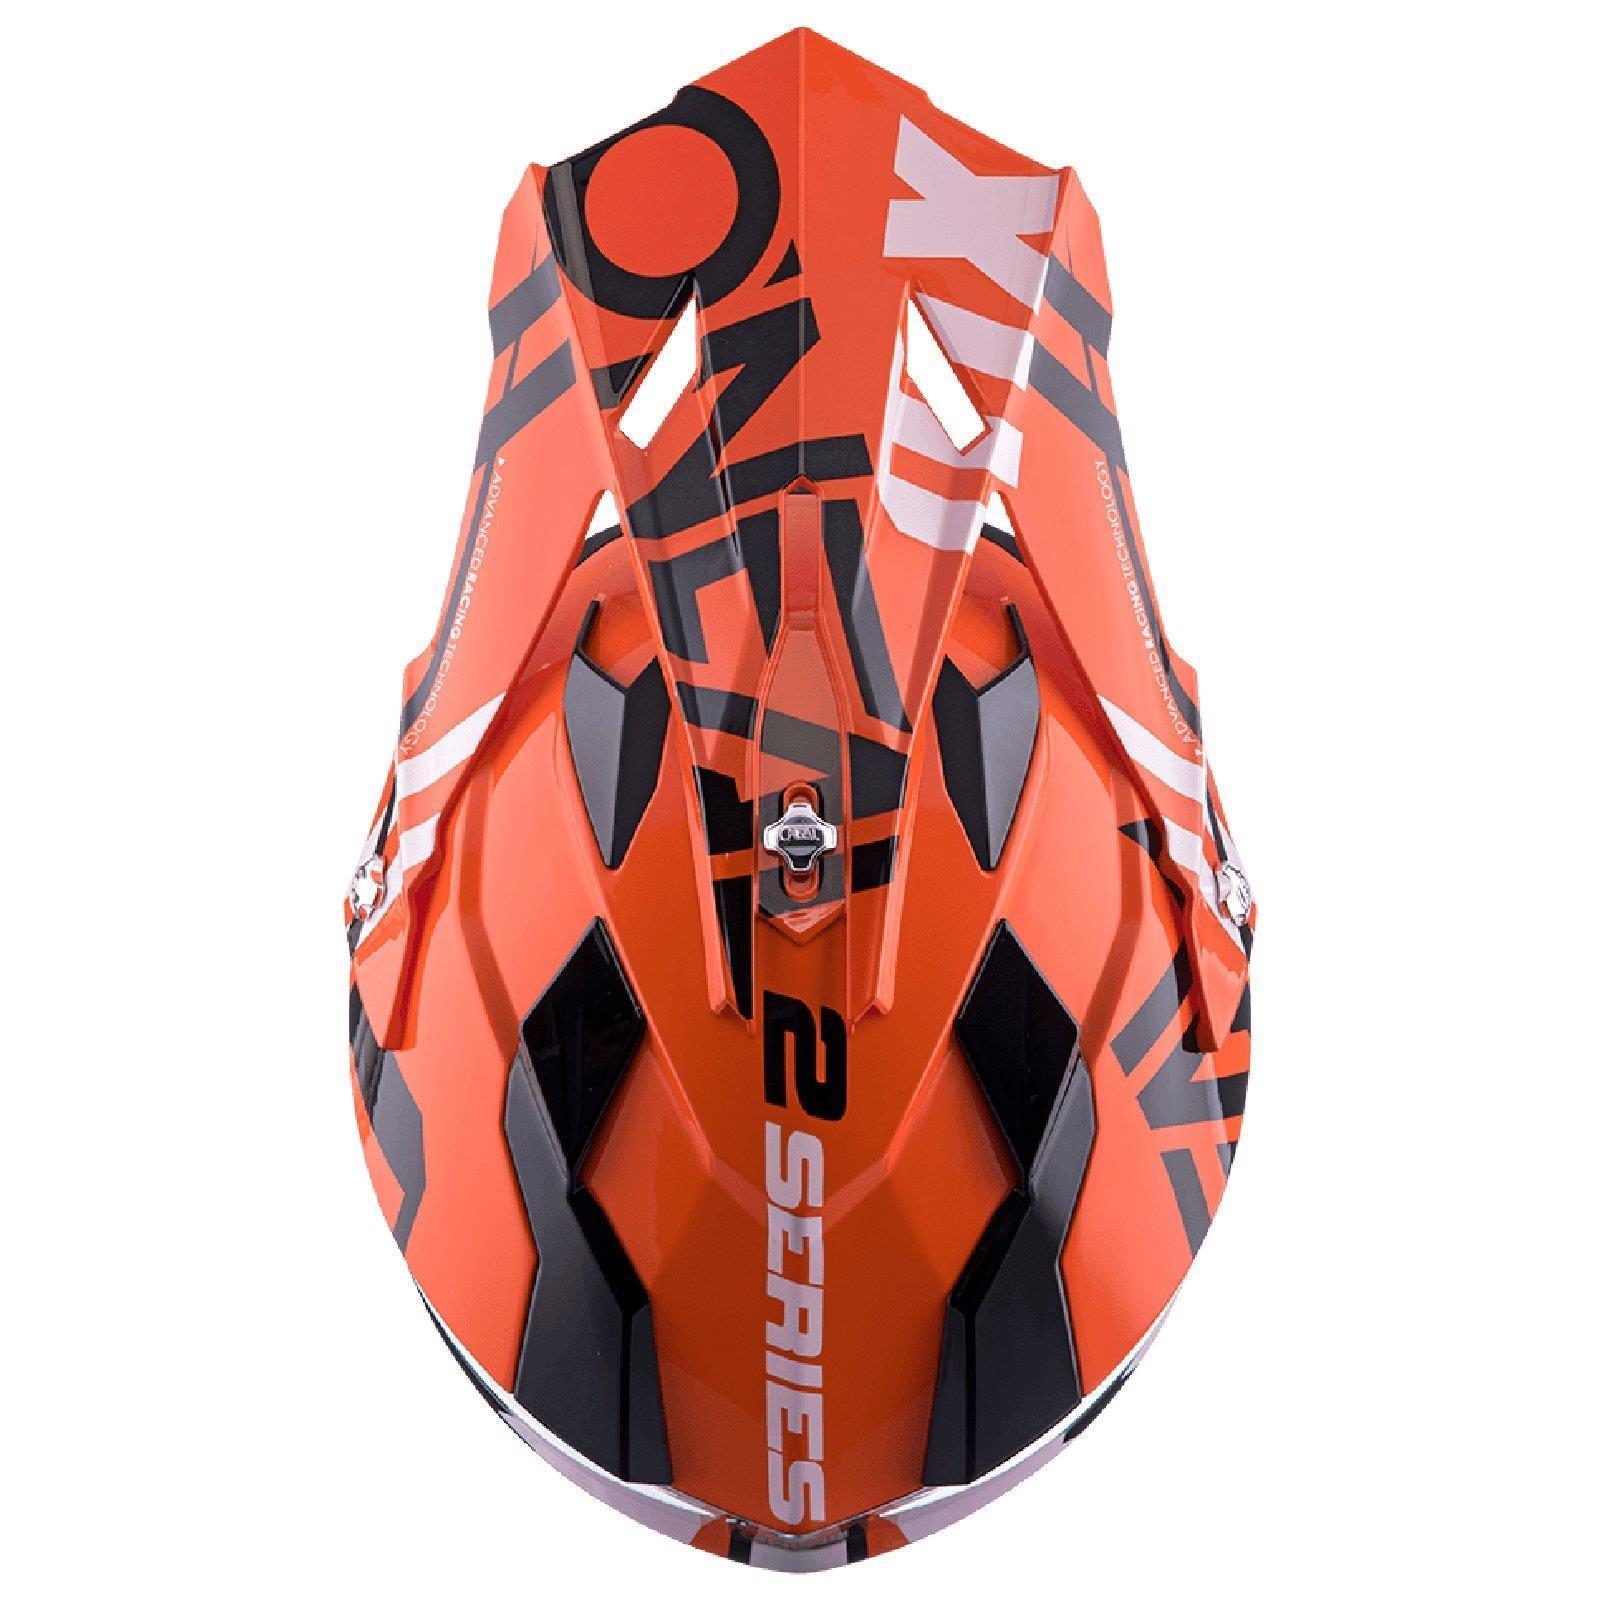 ONEAL-2-Series-RL-SPYDE-moto-cross-MX-Casco-Enduro-Trail-QUAD-OFFROAD-MOTO miniatura 18